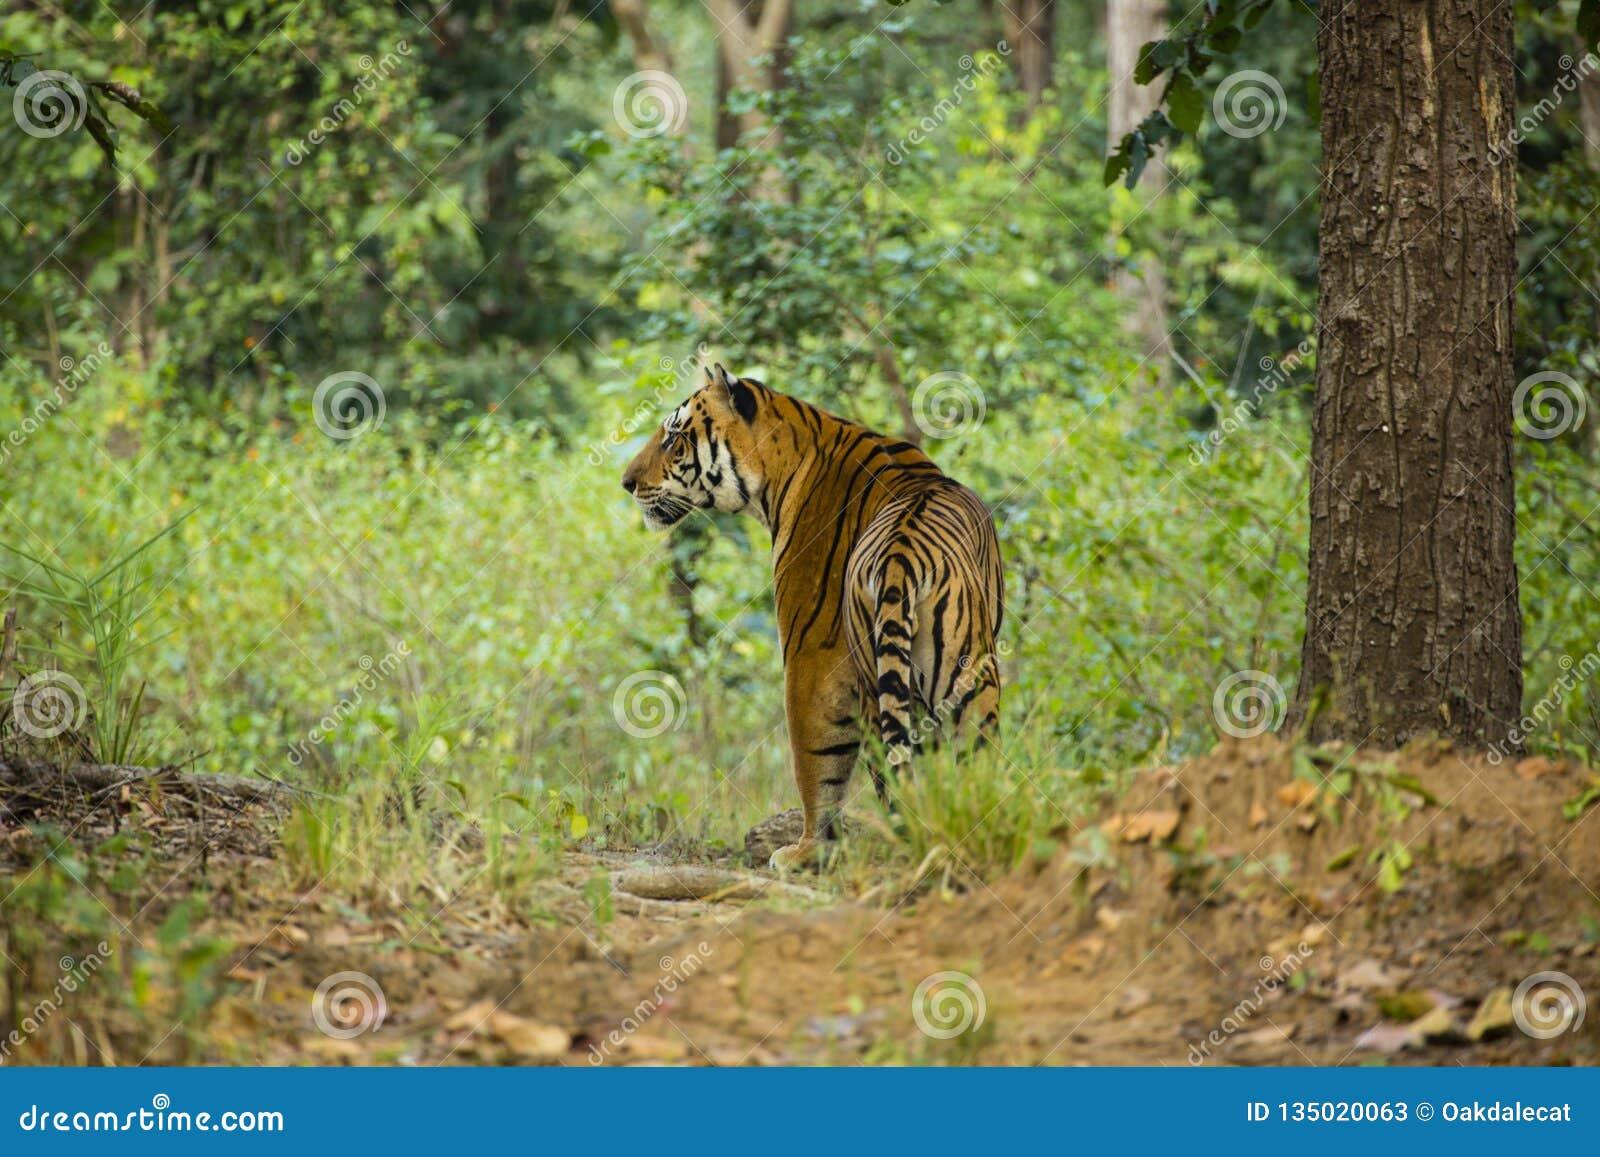 Wild Tiger in Jungle stock image  Image of jungle, feline